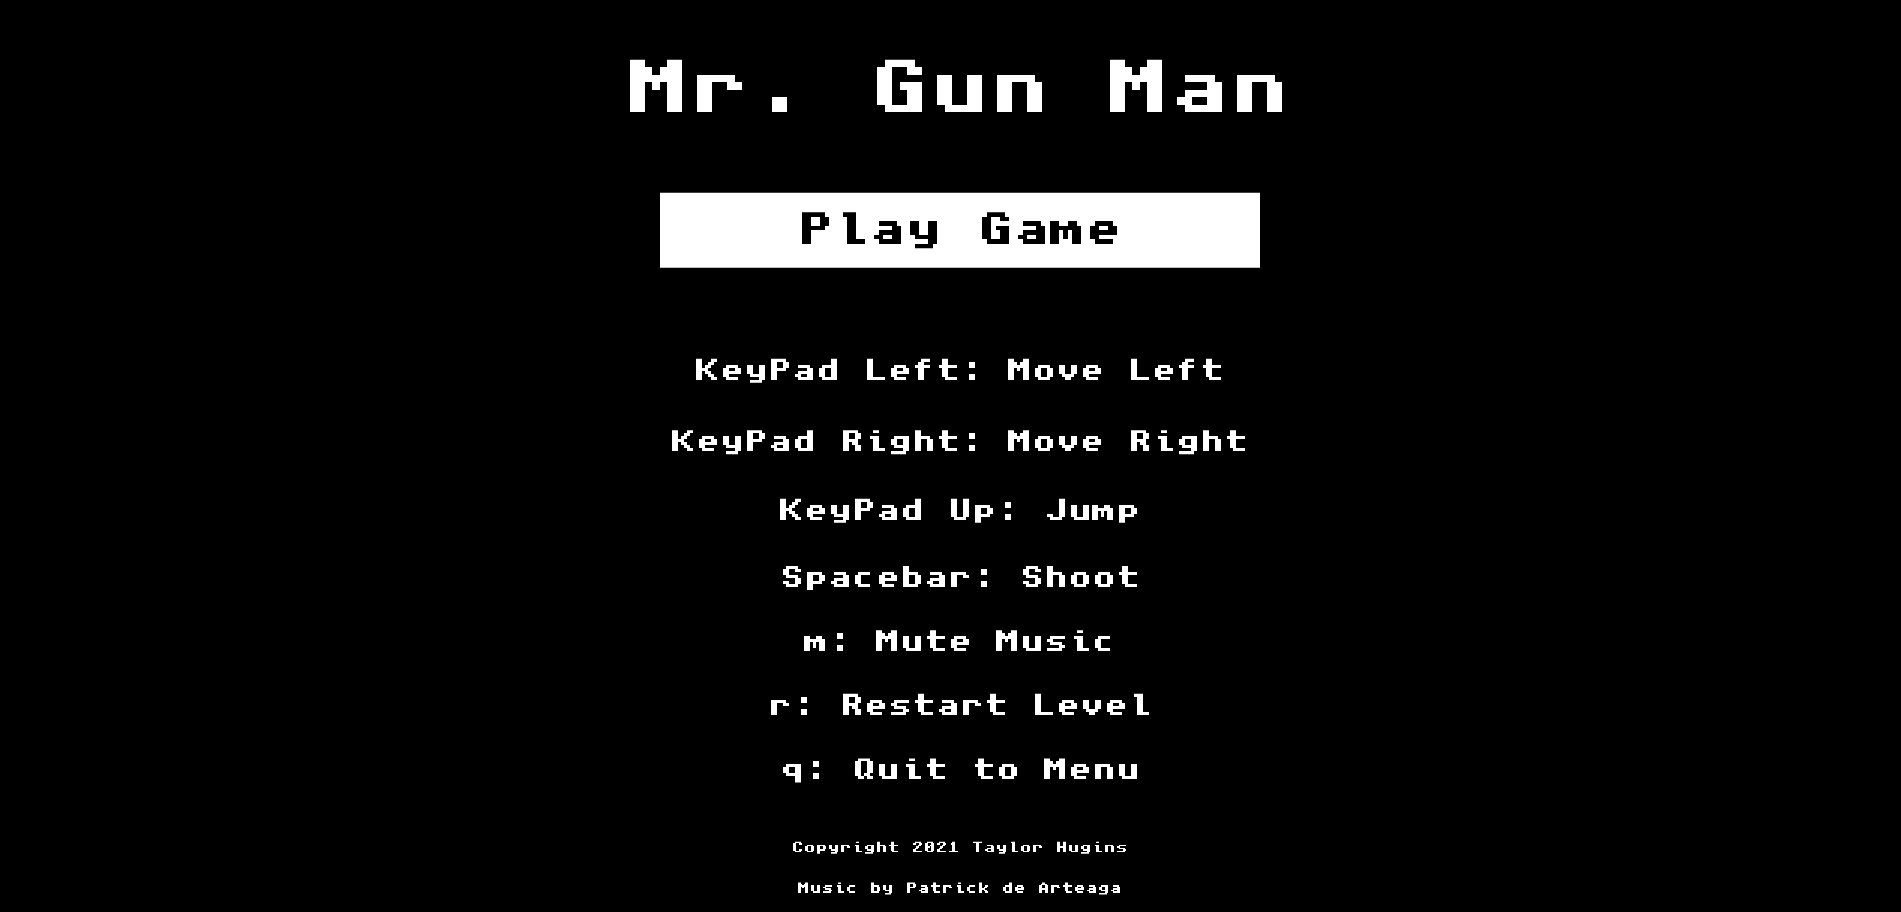 Mr. Gun Man